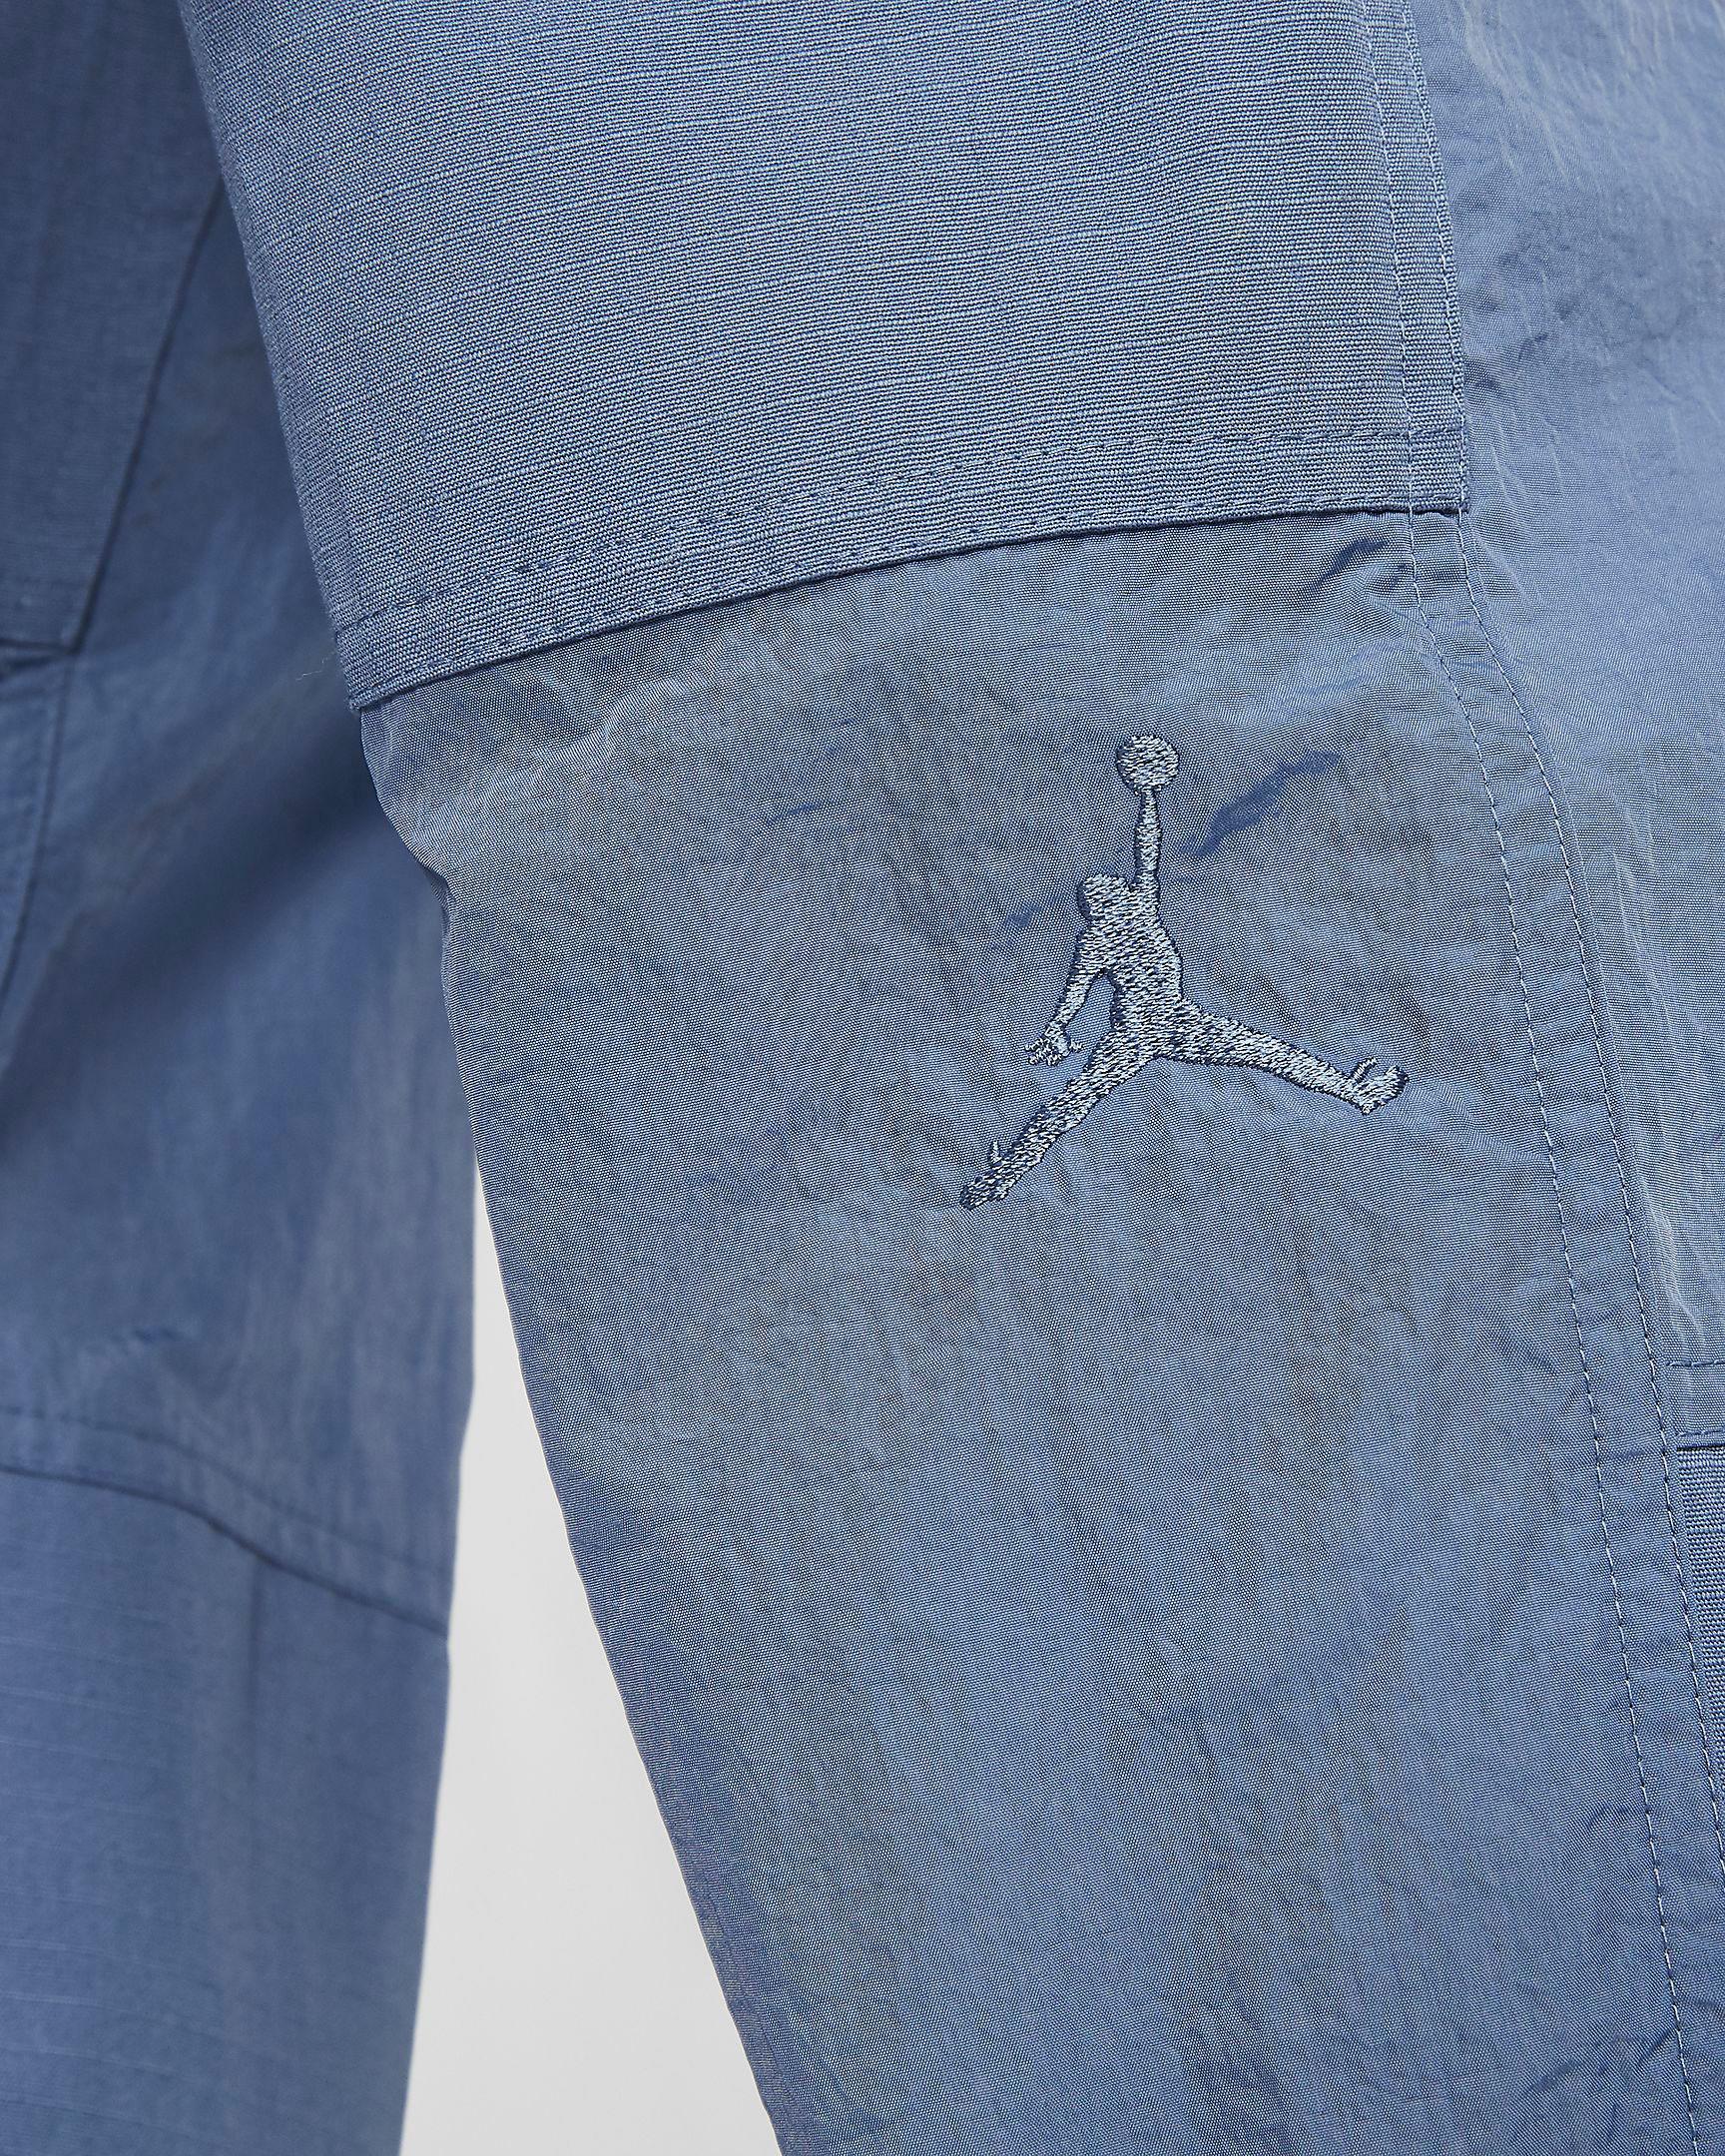 jordan-sport-dna-cargo-pants-navy-blue-4